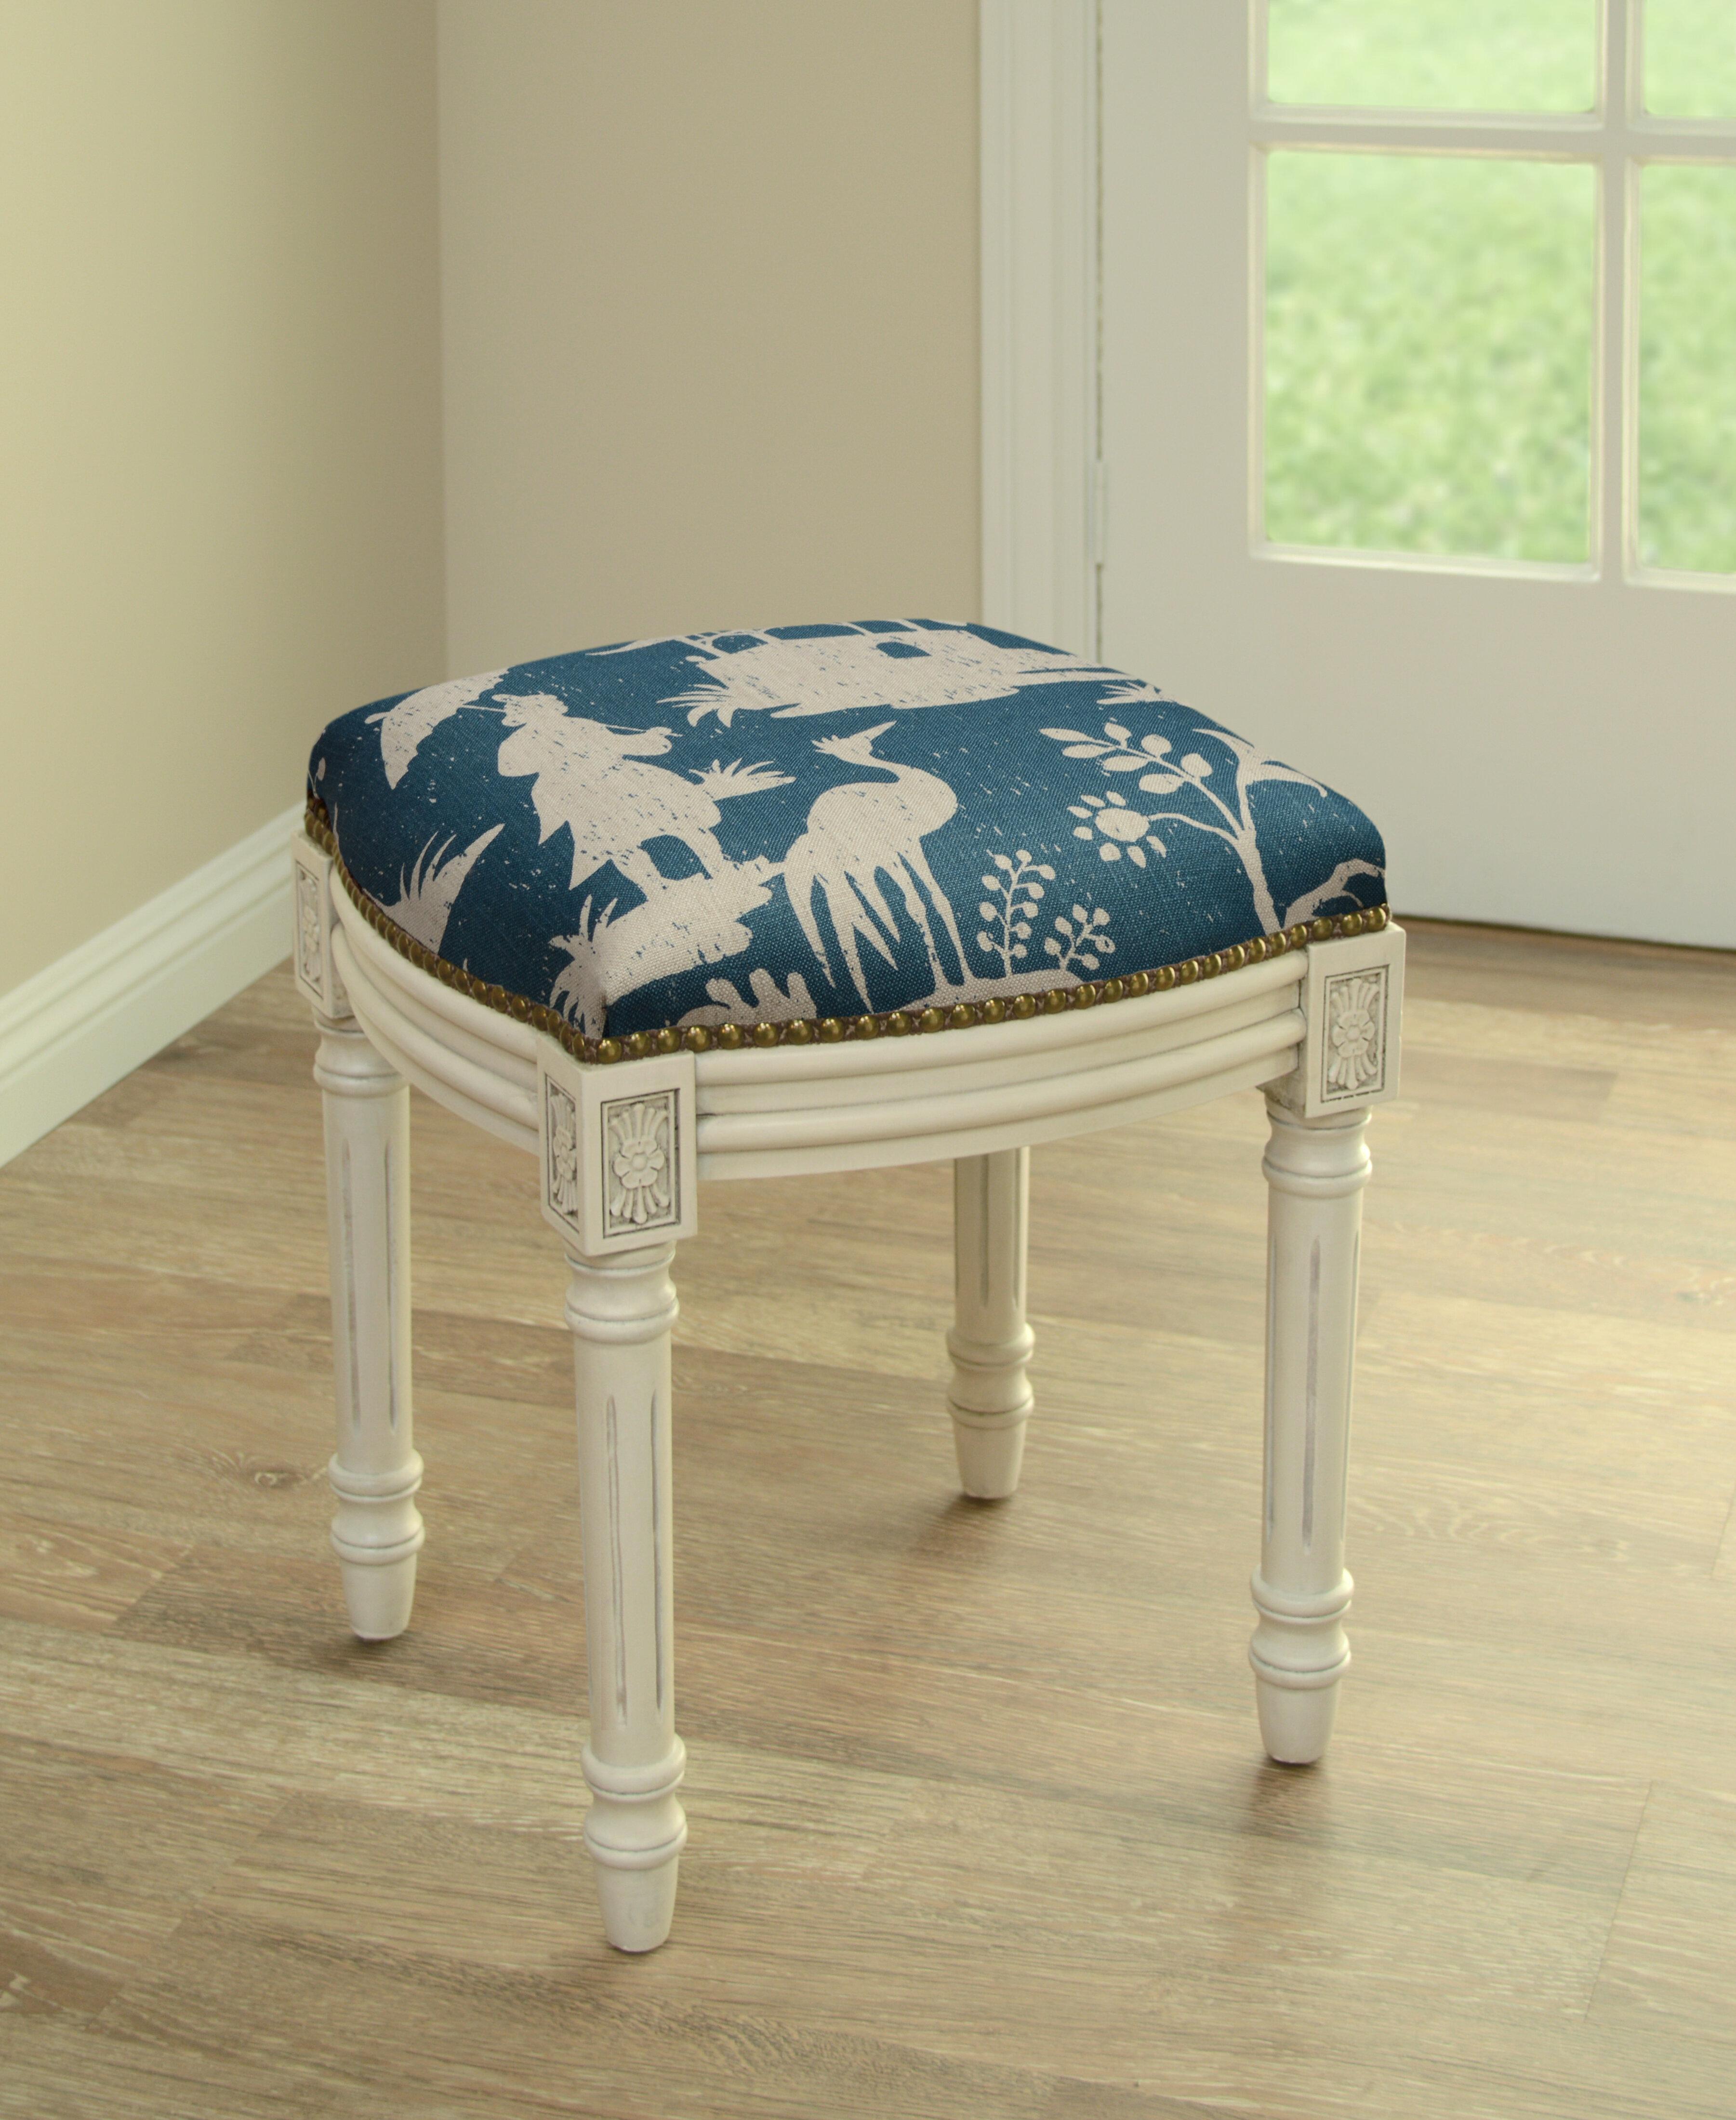 Magnificent World Menagerie Artic Chinoiserie Linen Upholstered Vanity Spiritservingveterans Wood Chair Design Ideas Spiritservingveteransorg